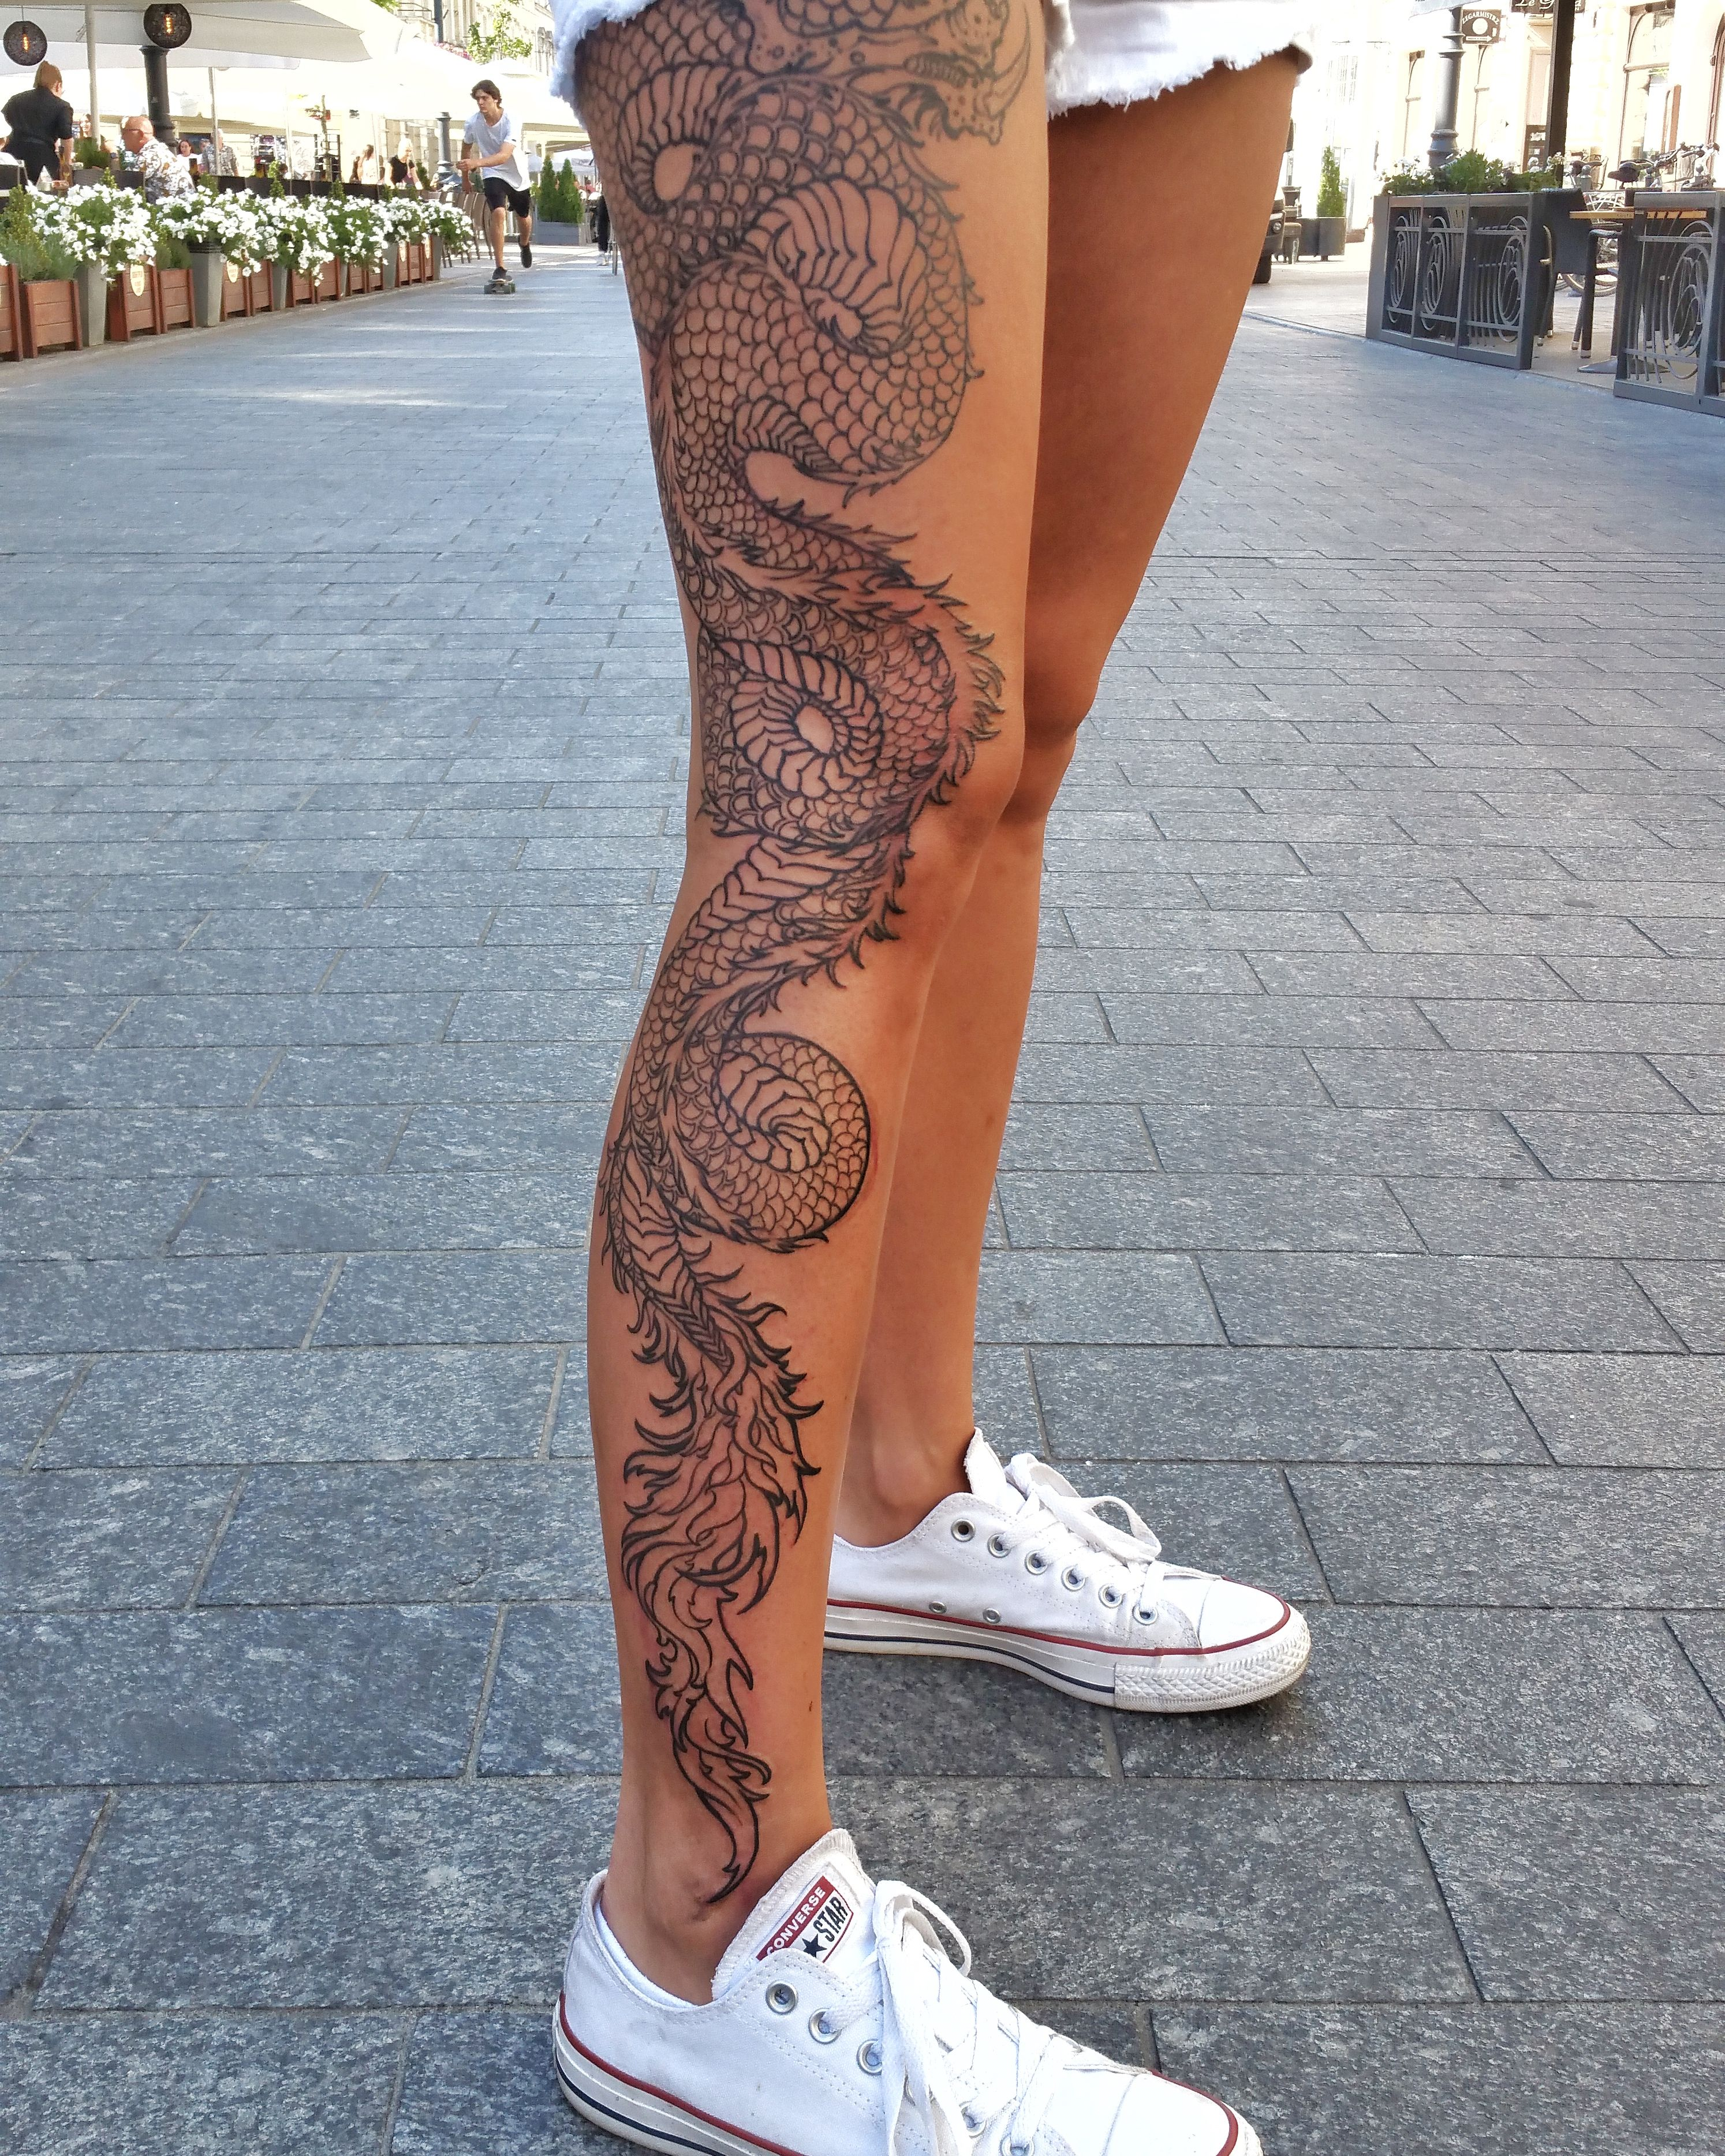 Dragon In 2020 Girl Leg Tattoos Leg Tattoos Women Dragon Tattoo Designs